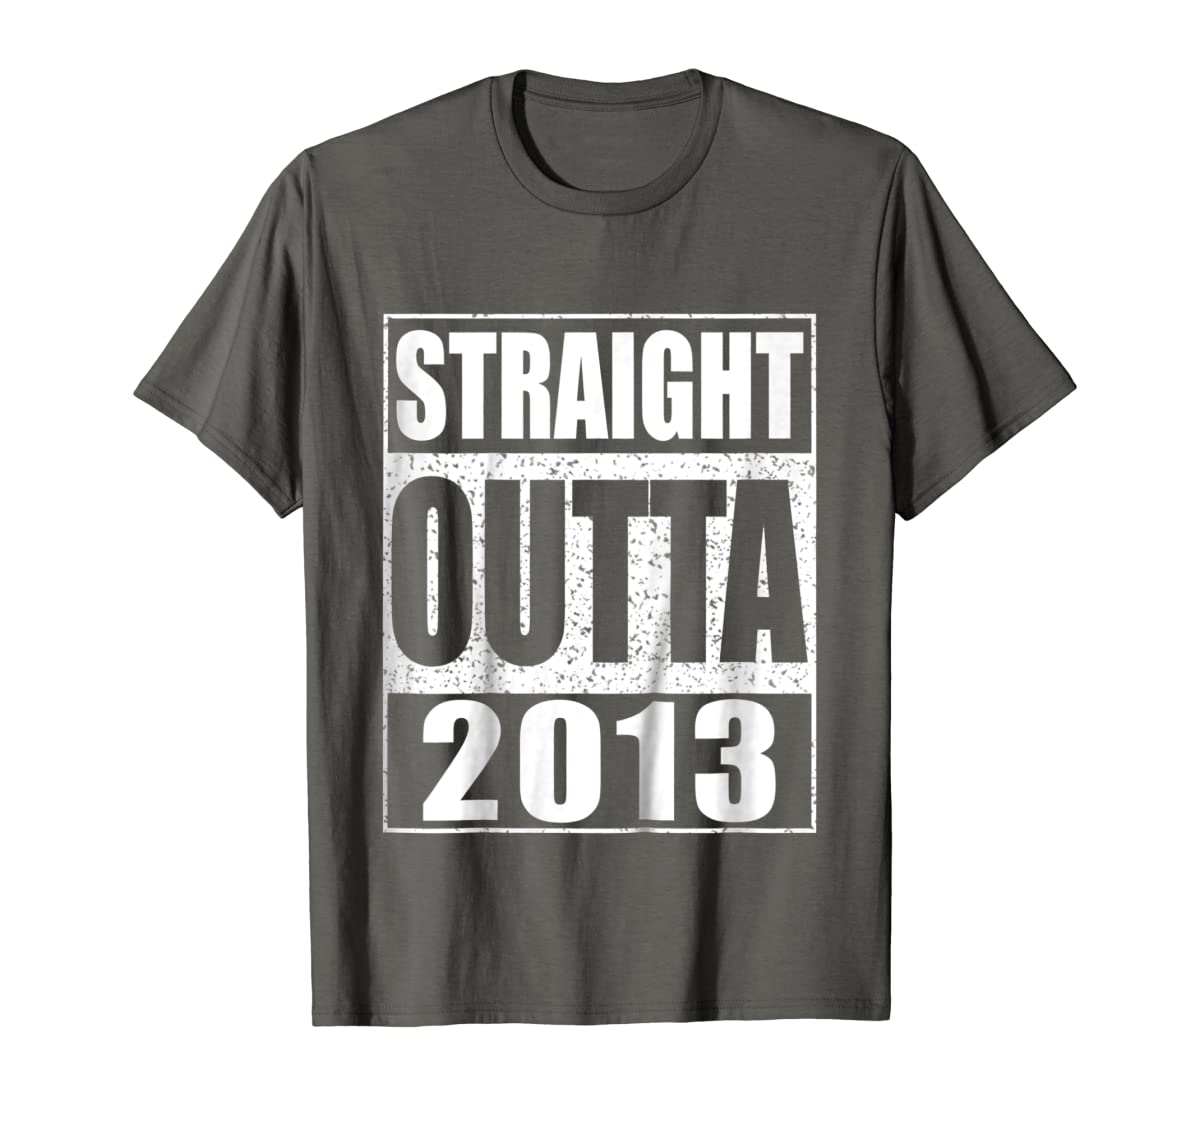 Kids Straight Outta 2013 T-Shirt 6th Birthday Gift Shirt-Men's T-Shirt-Dark Heather